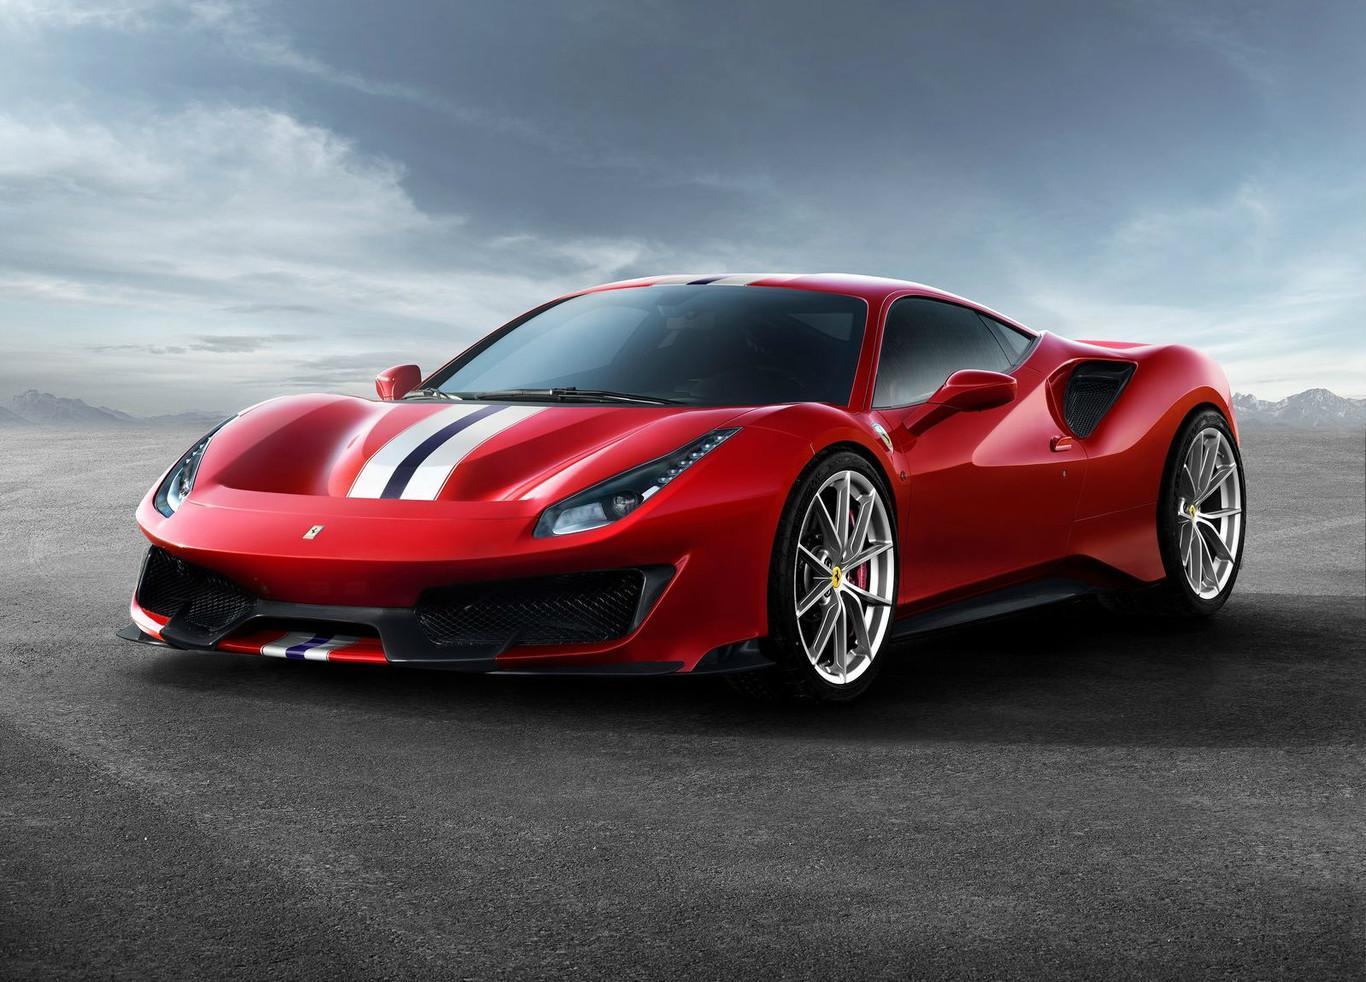 Ferrari Lanzará 15 Nuevos Modelos De 2019 A 2022